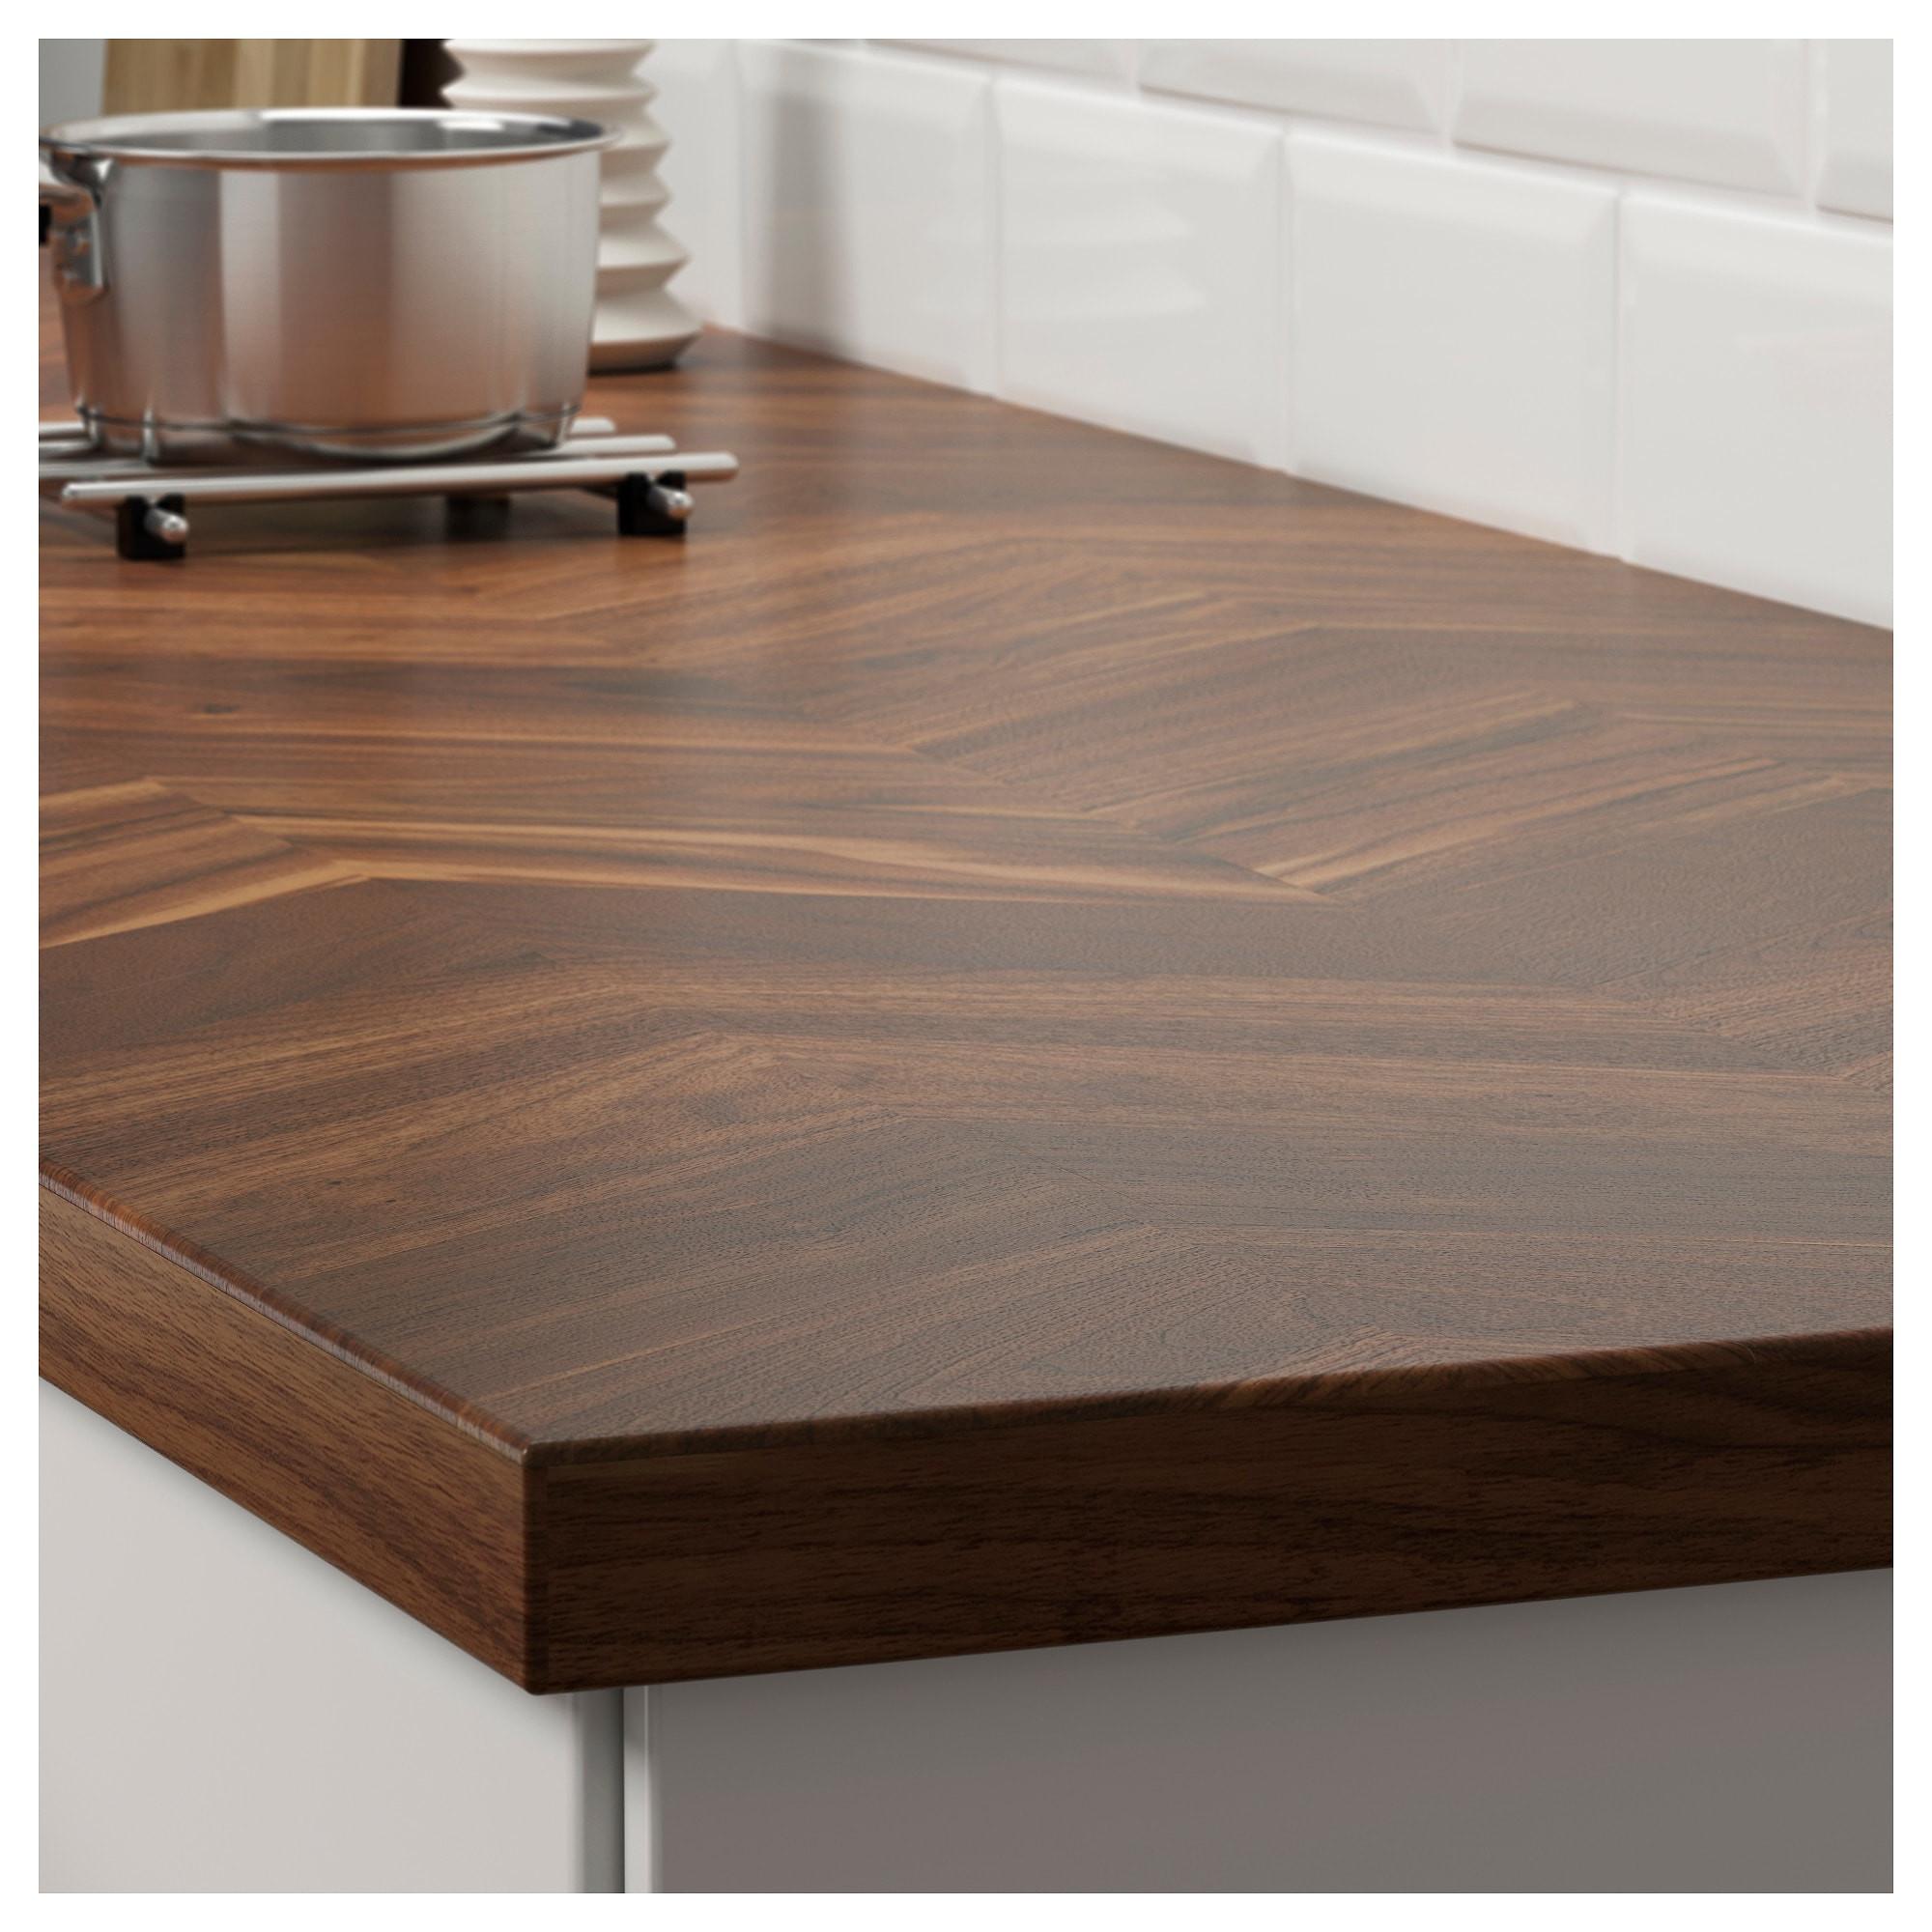 hardwood floor store bolingbrook il of barkaboda countertop 98x1 1 2 ikea for 0444085 pe594698 s5 jpg